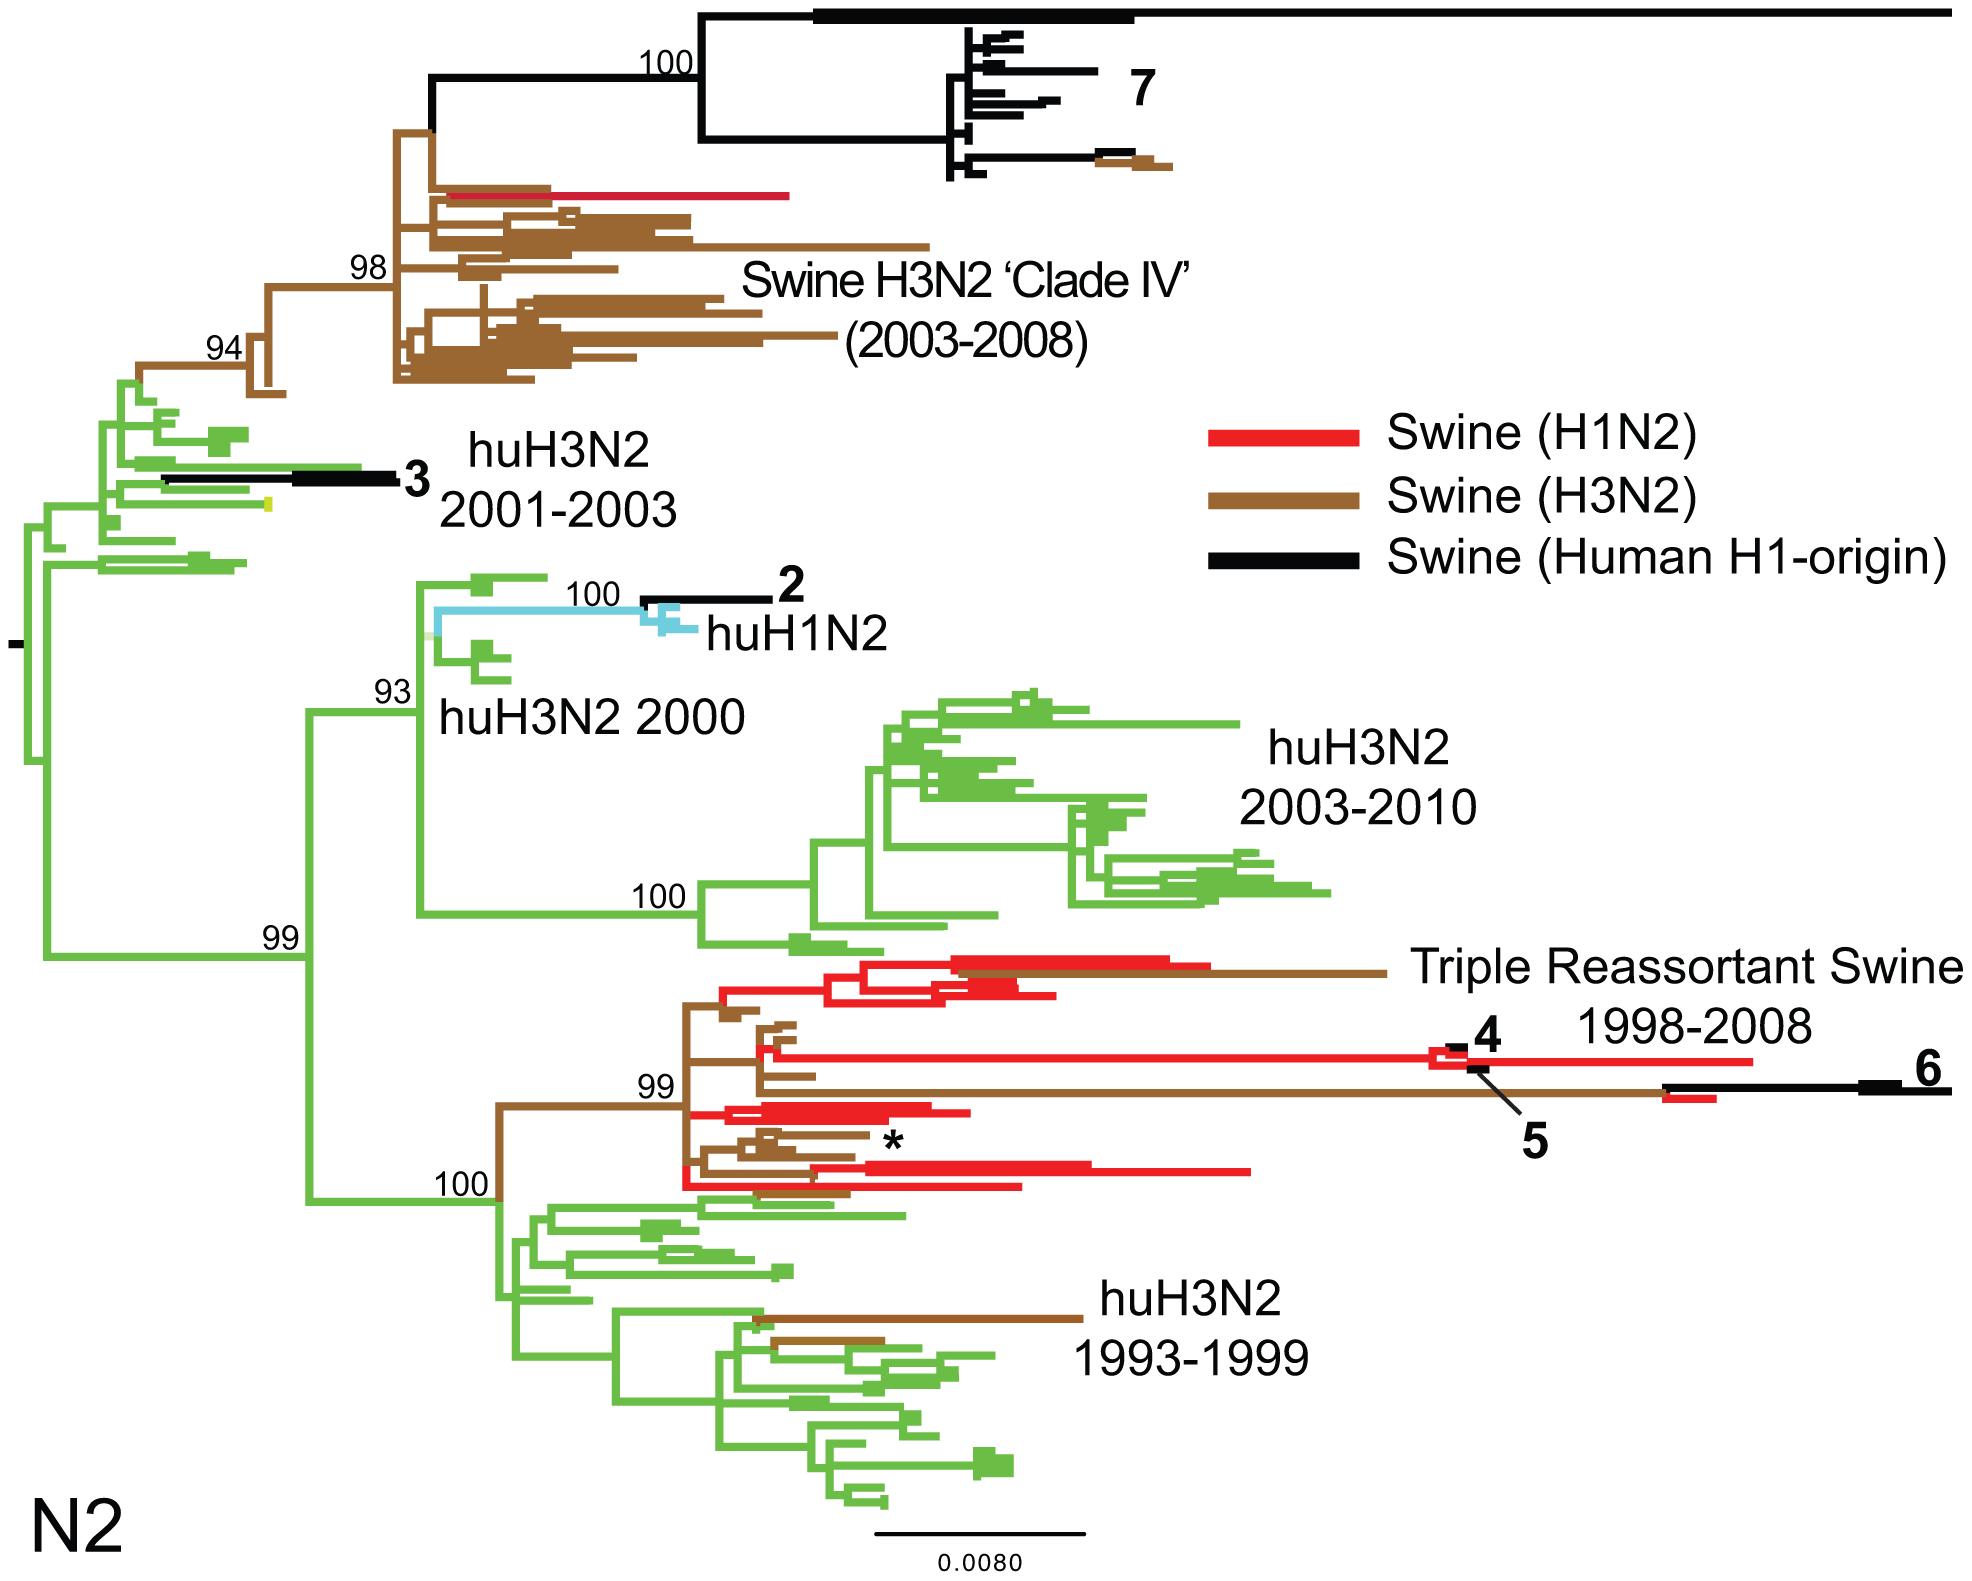 Phylogenetic relationships of the NA (N2) segment.